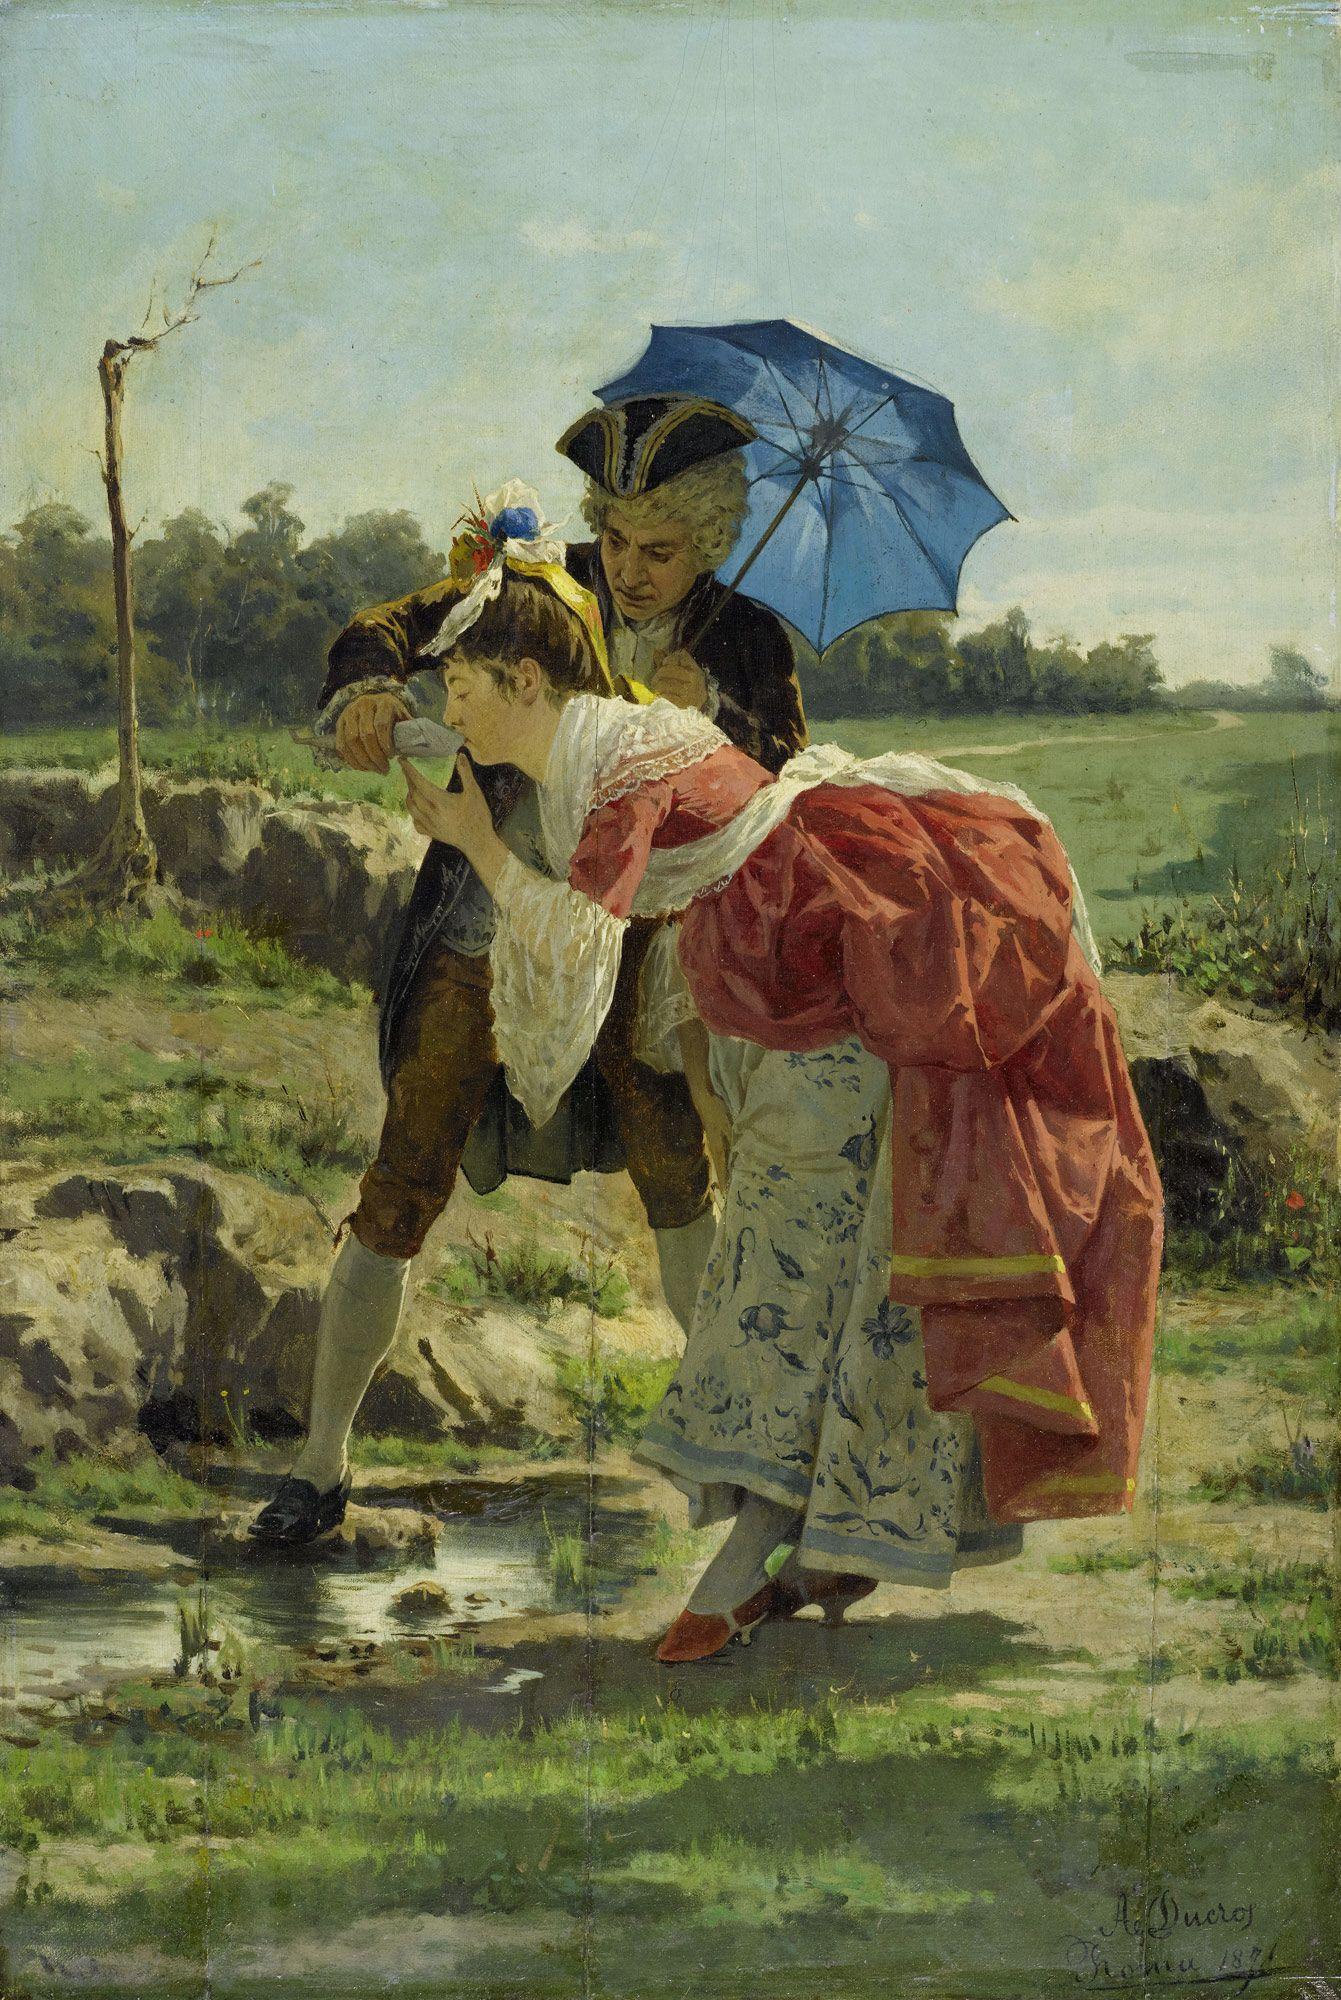 By Antoine Ducrot (1814–?) (Koller Auktionen) [Public domain], <a href=